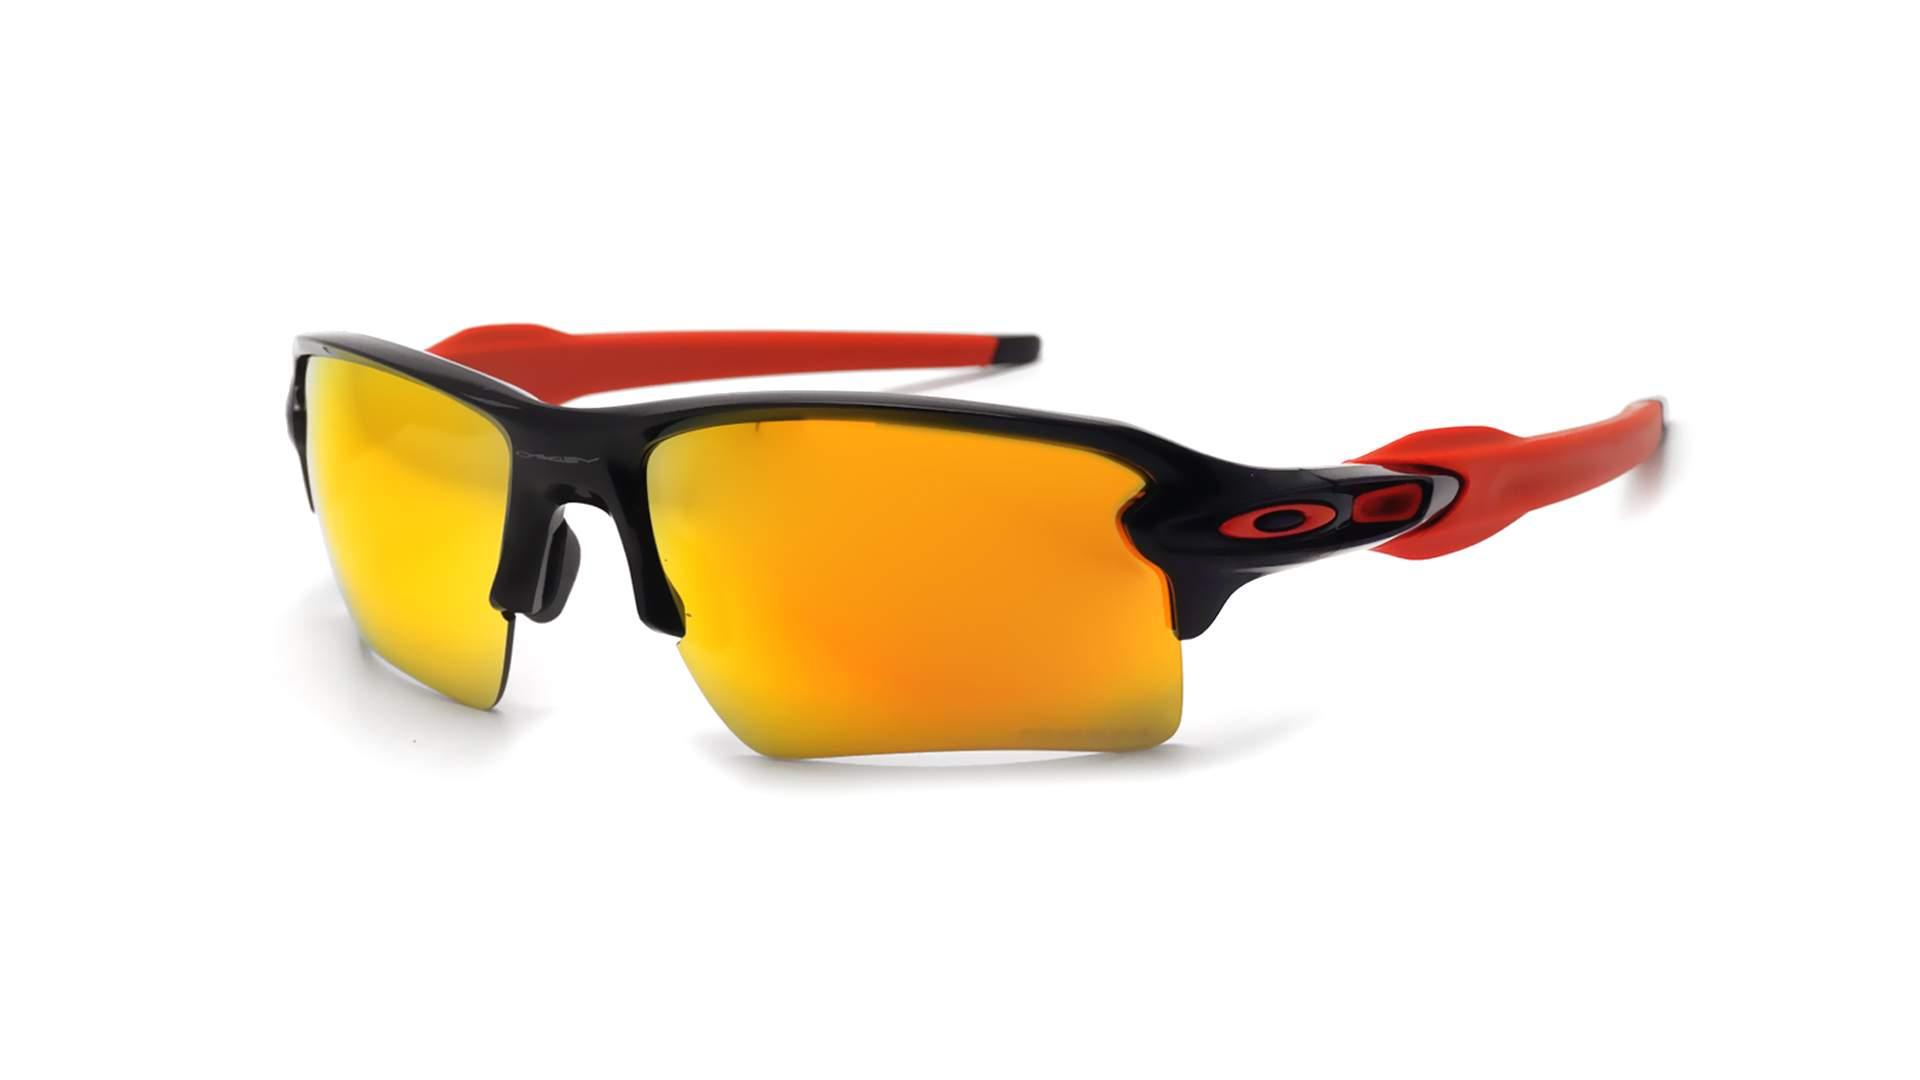 aecd707bf2021 Sunglasses Oakley Flak Jacket 2.0 xl Black Prizm OO9188 80 59-12 Large  Mirror